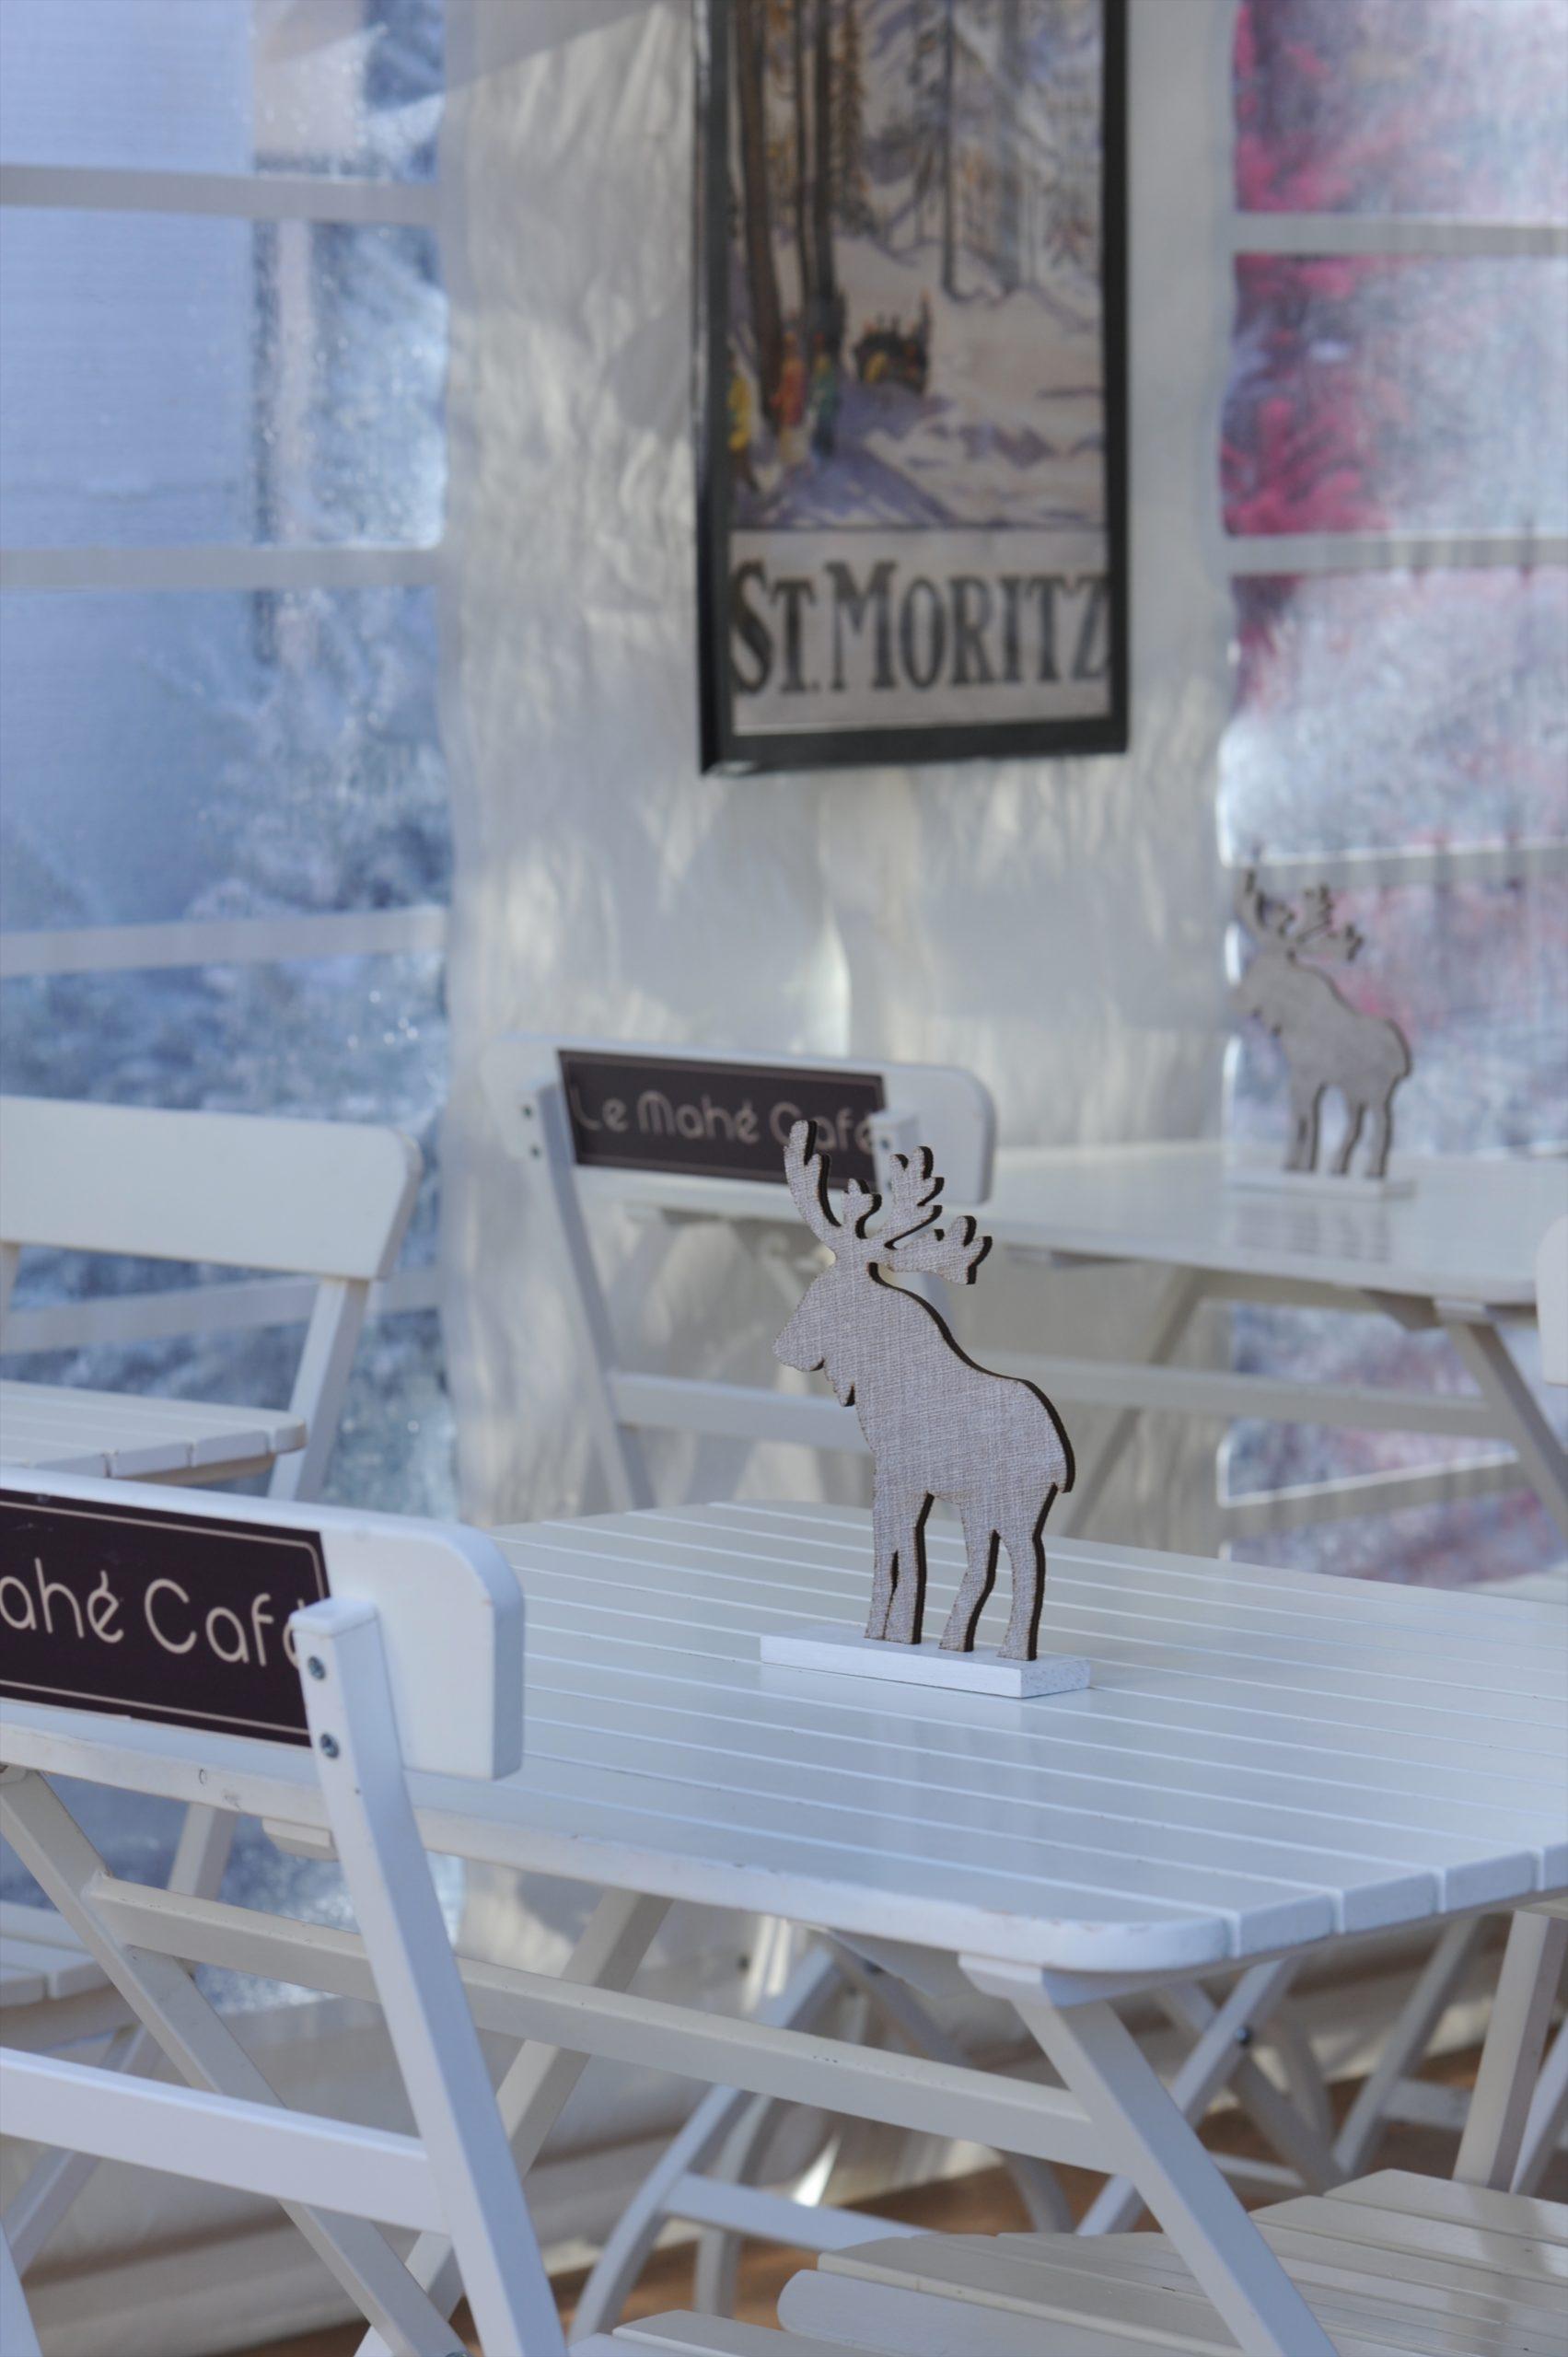 le mahé café hiver vanessa romano dsc 7603 scaled